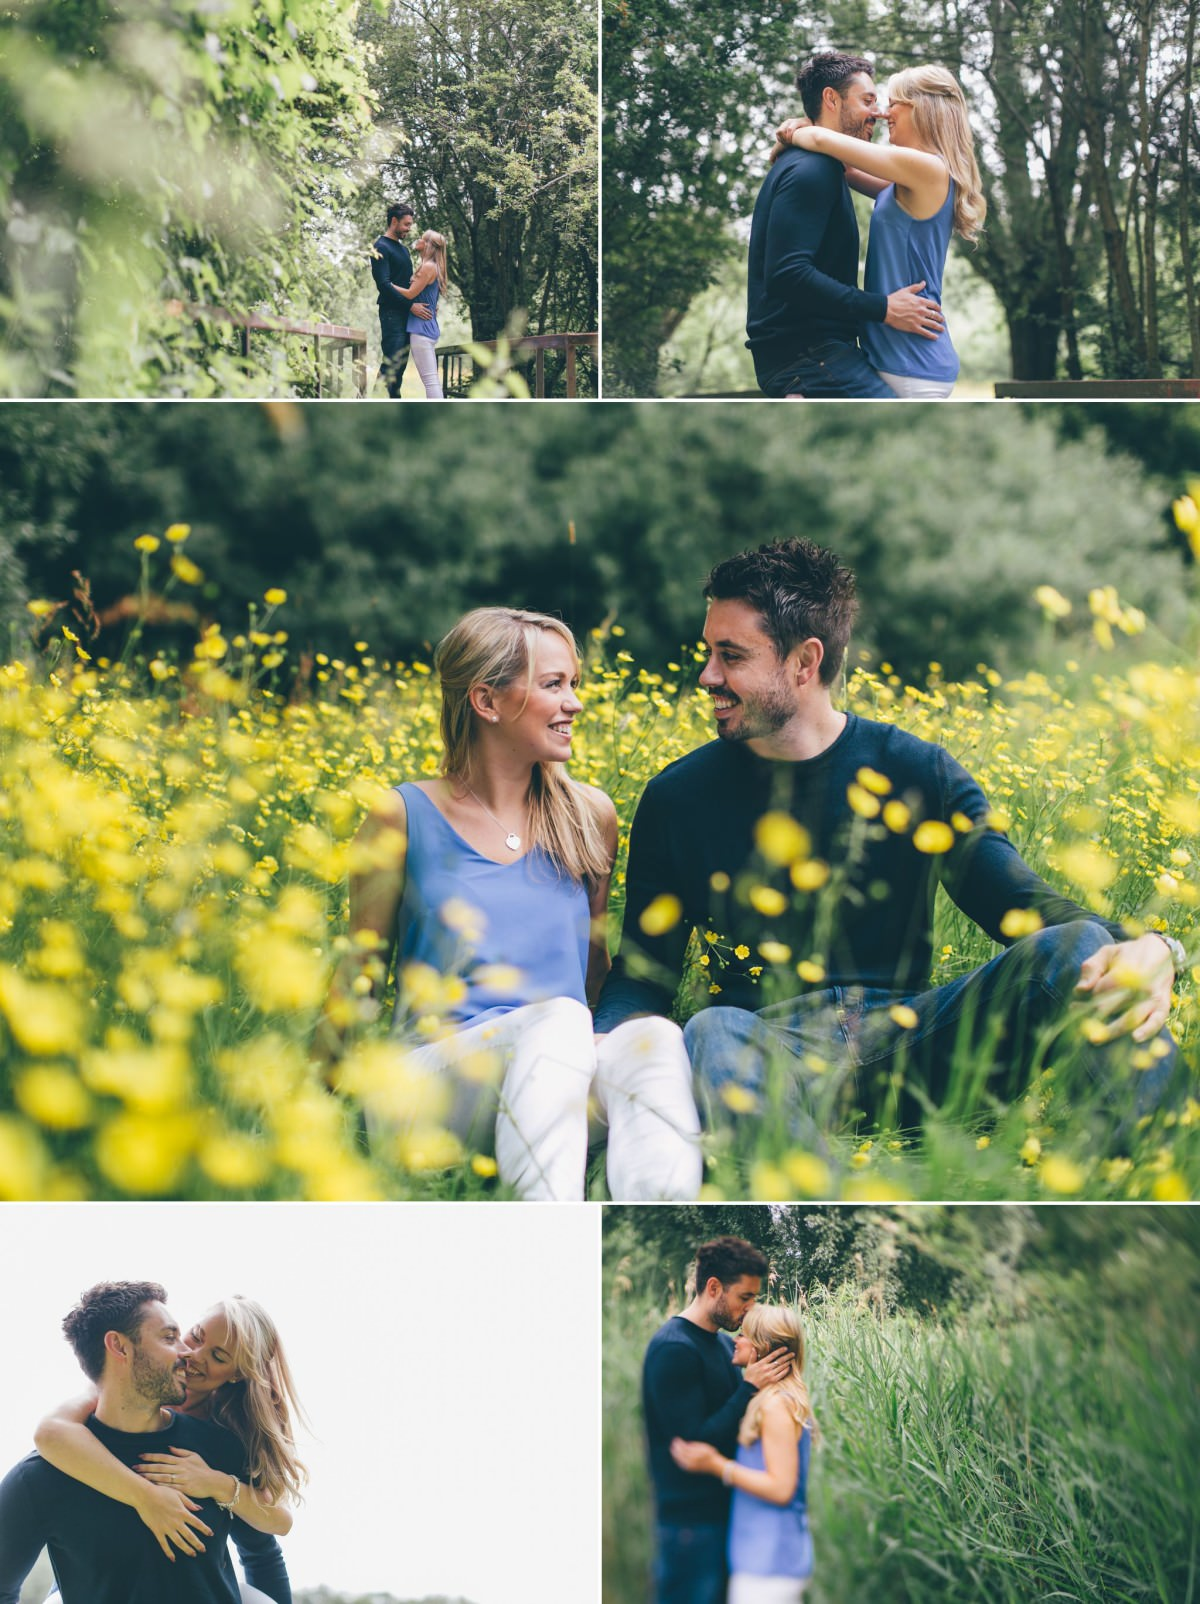 rachel_lambert_photography_welsh_wedding_photographer_harriet_dean_engagement_shoot_caldicot_castle_lower_slaughter_manor_house_ 11